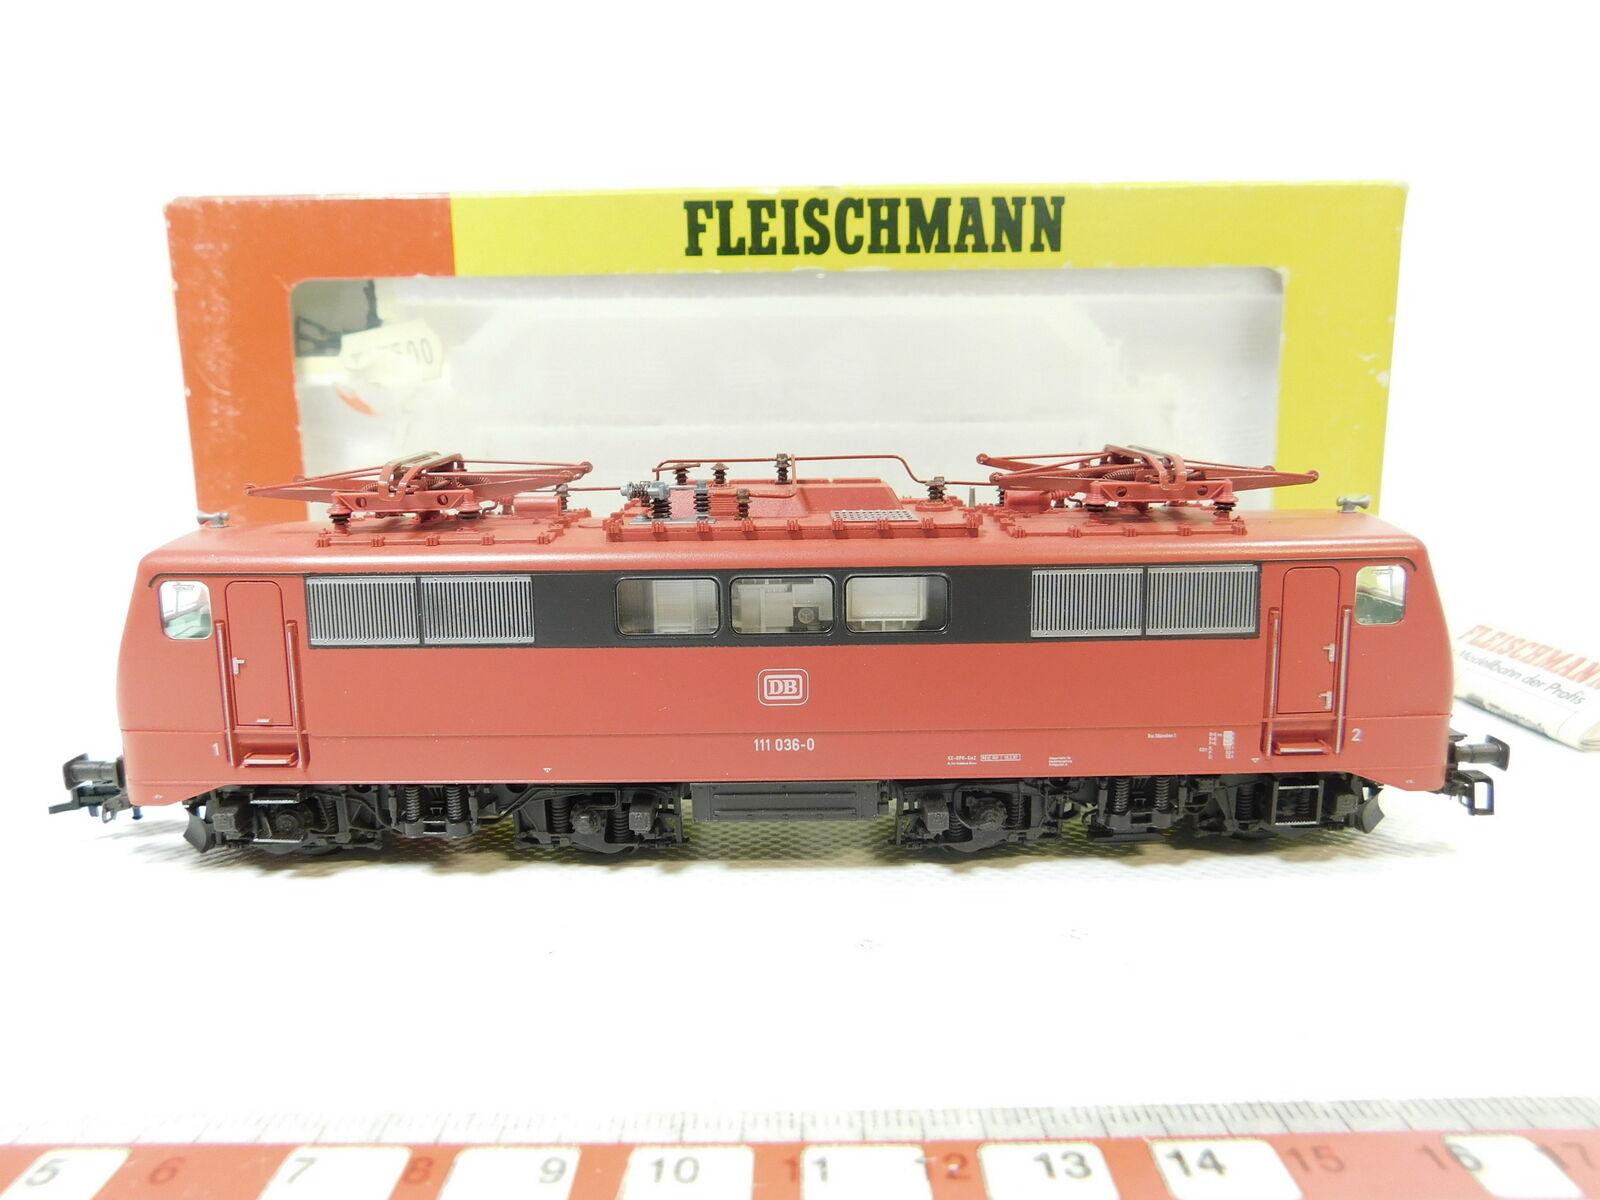 Bg188-1Fleischmann H0 DC 4347 Electric Locomotive E-LOCOMOTIVE 111 036-0 DB